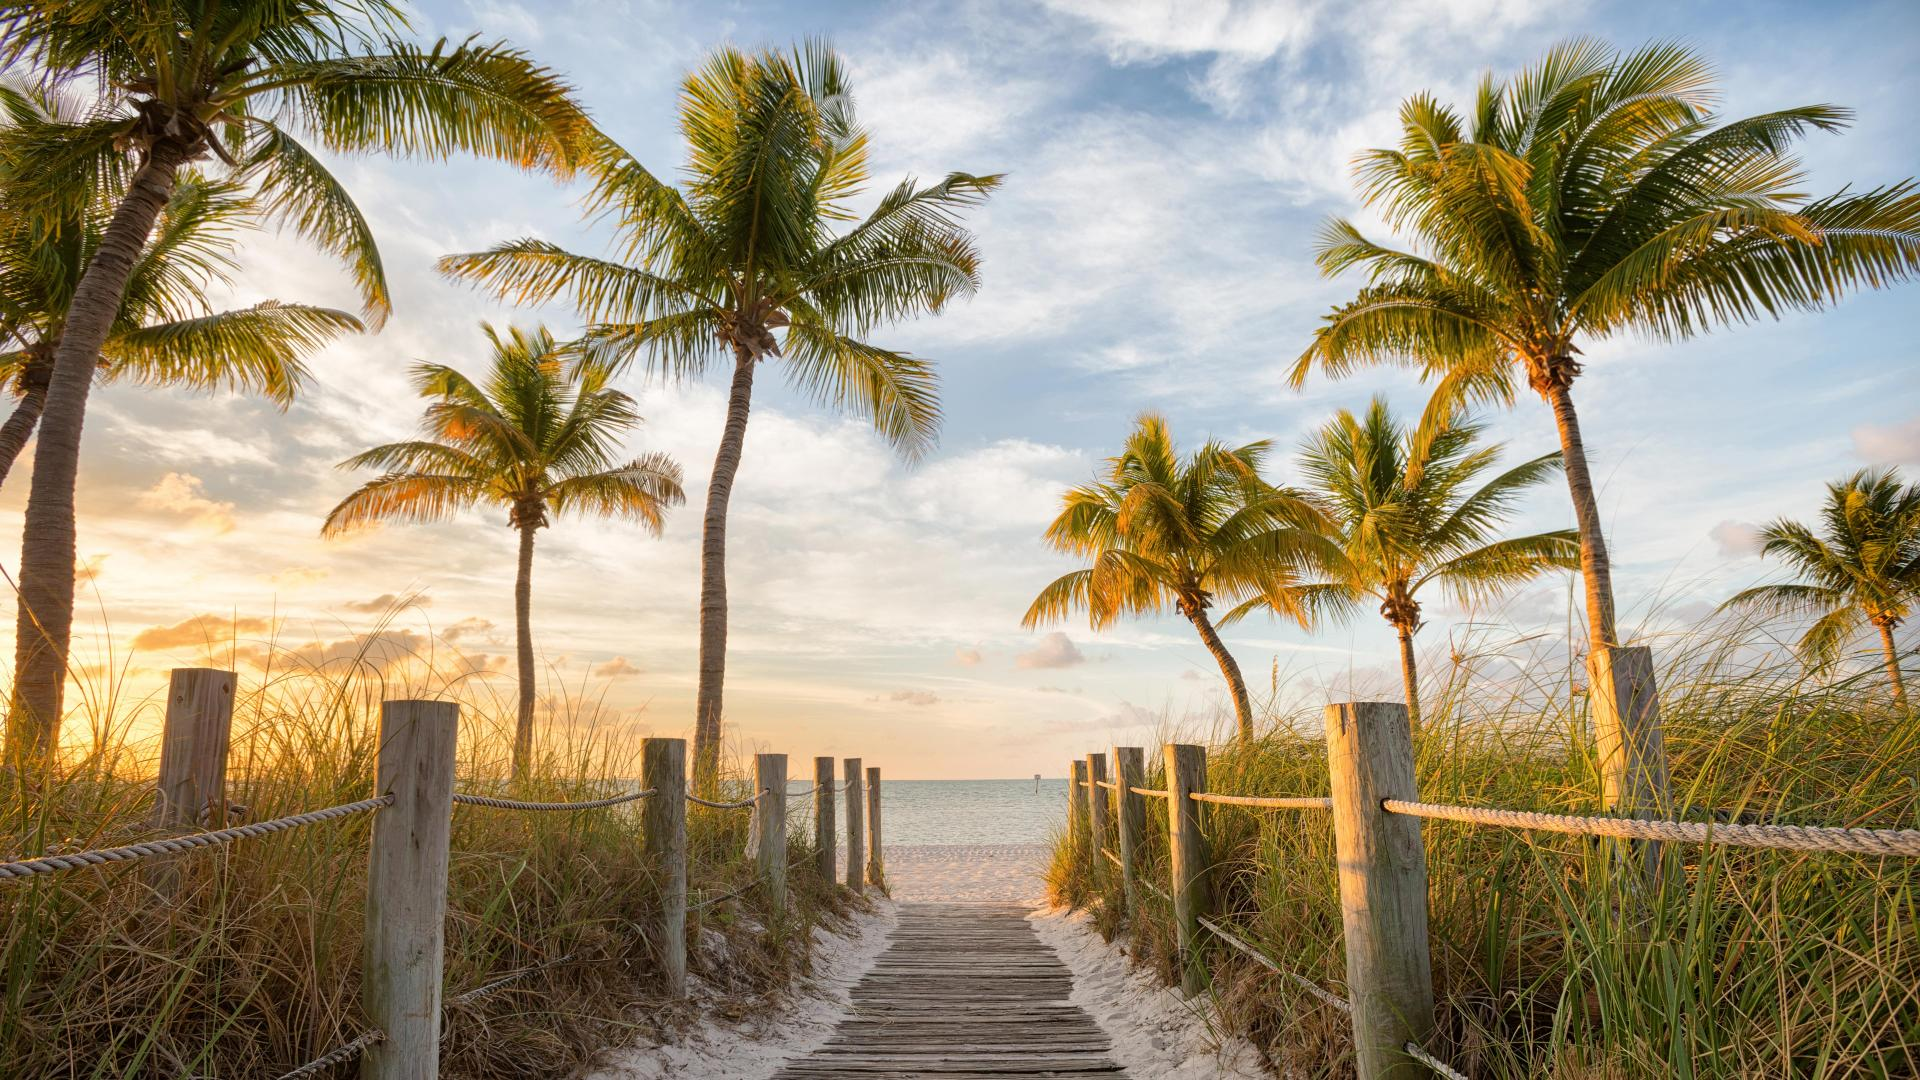 American road trip to Key West, Florida